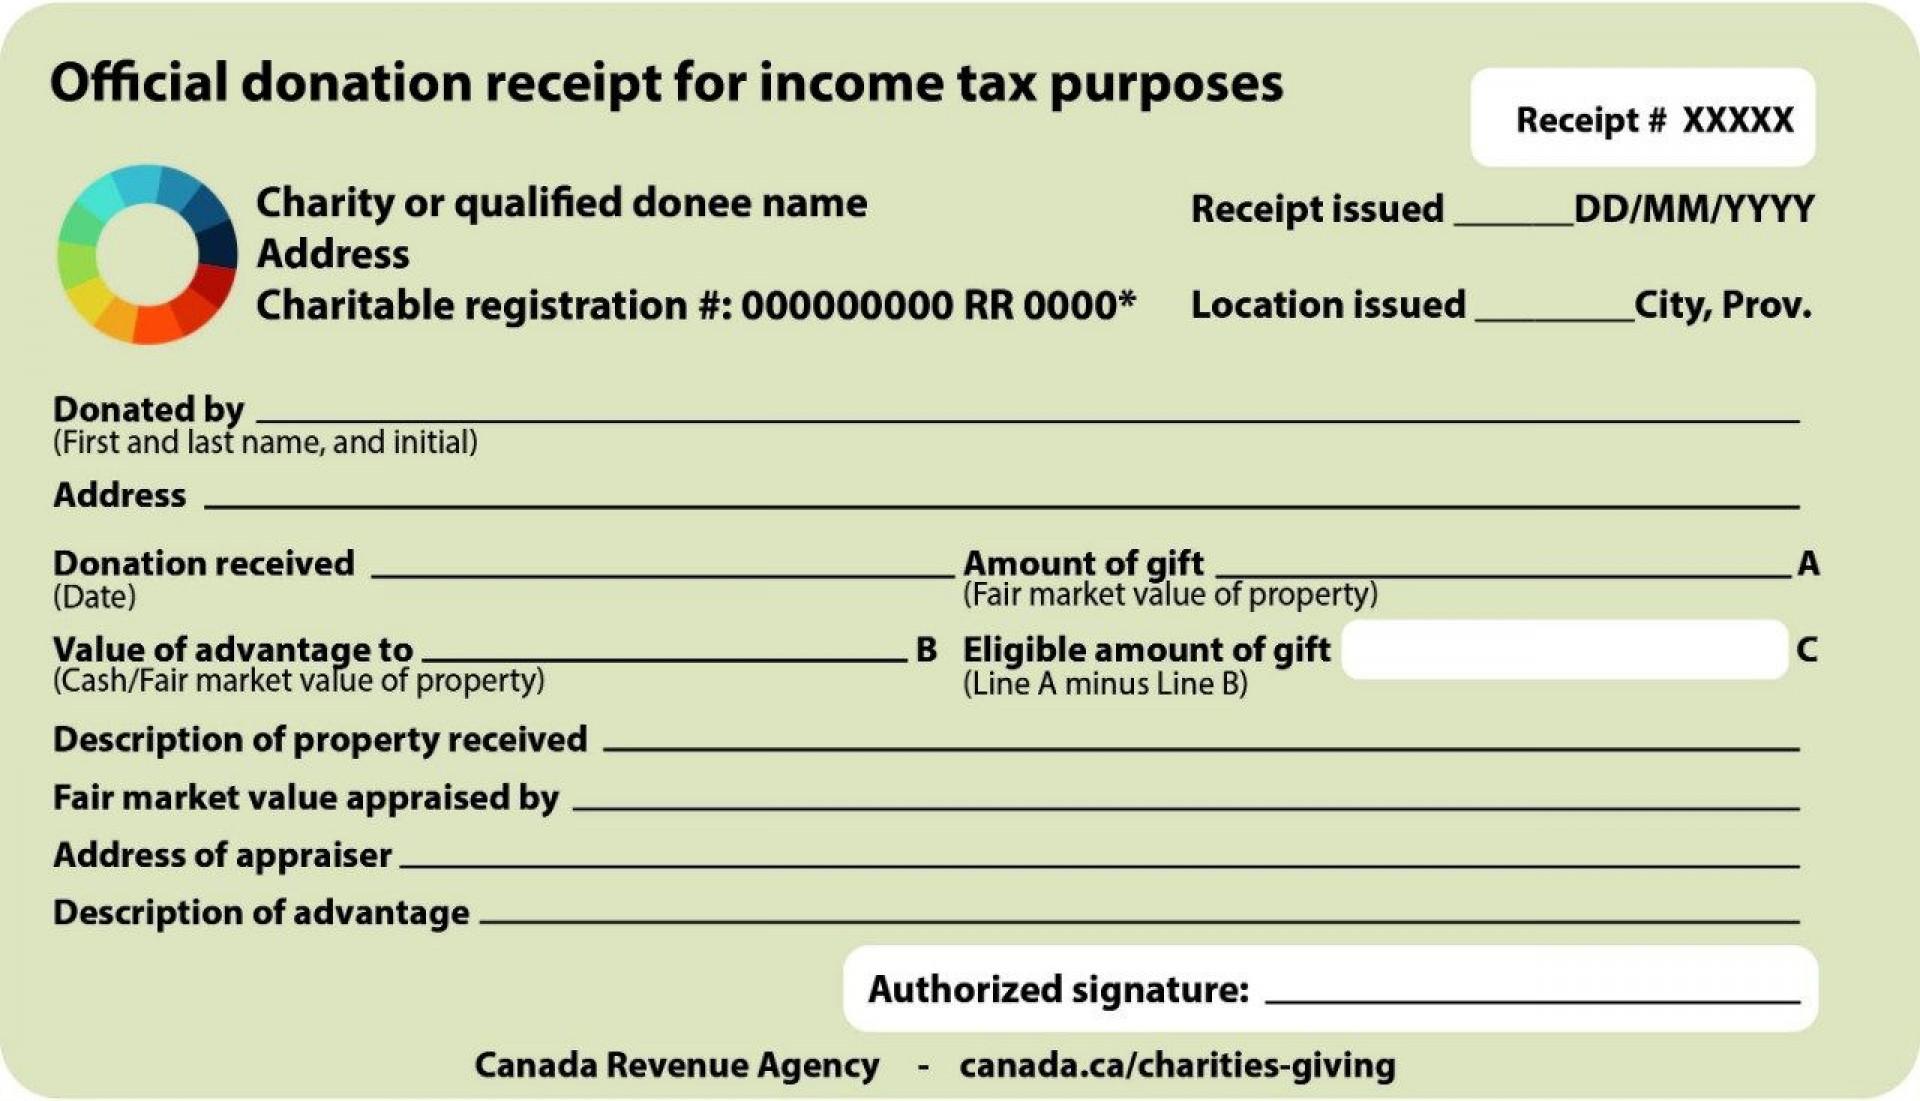 004 Unusual Charitable Tax Receipt Template Highest Clarity  Donation1920